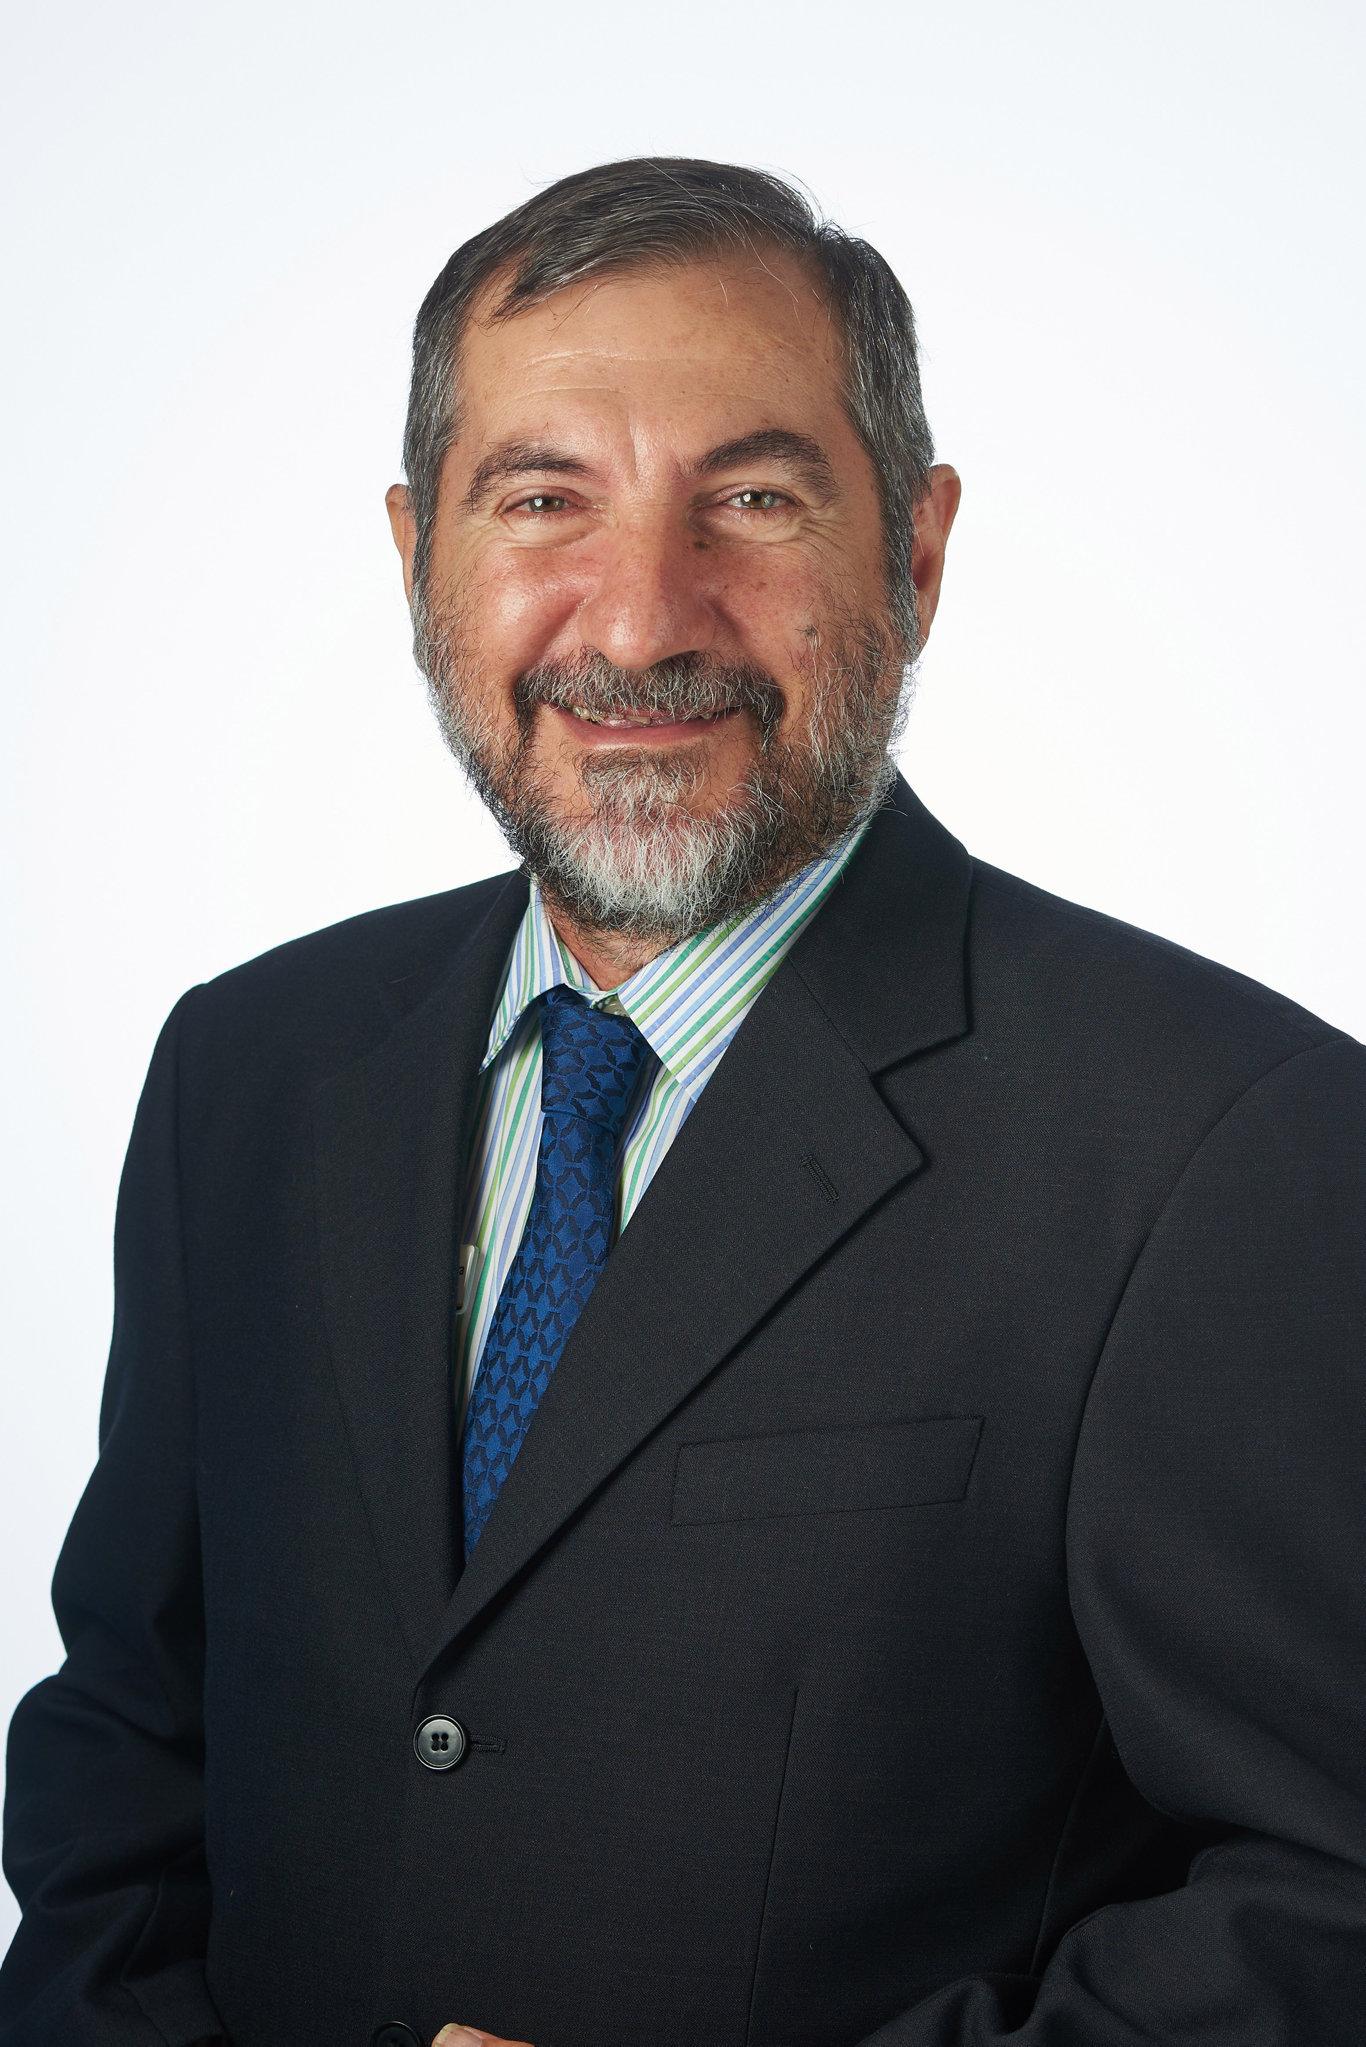 Cr Laurence Bonaventura.